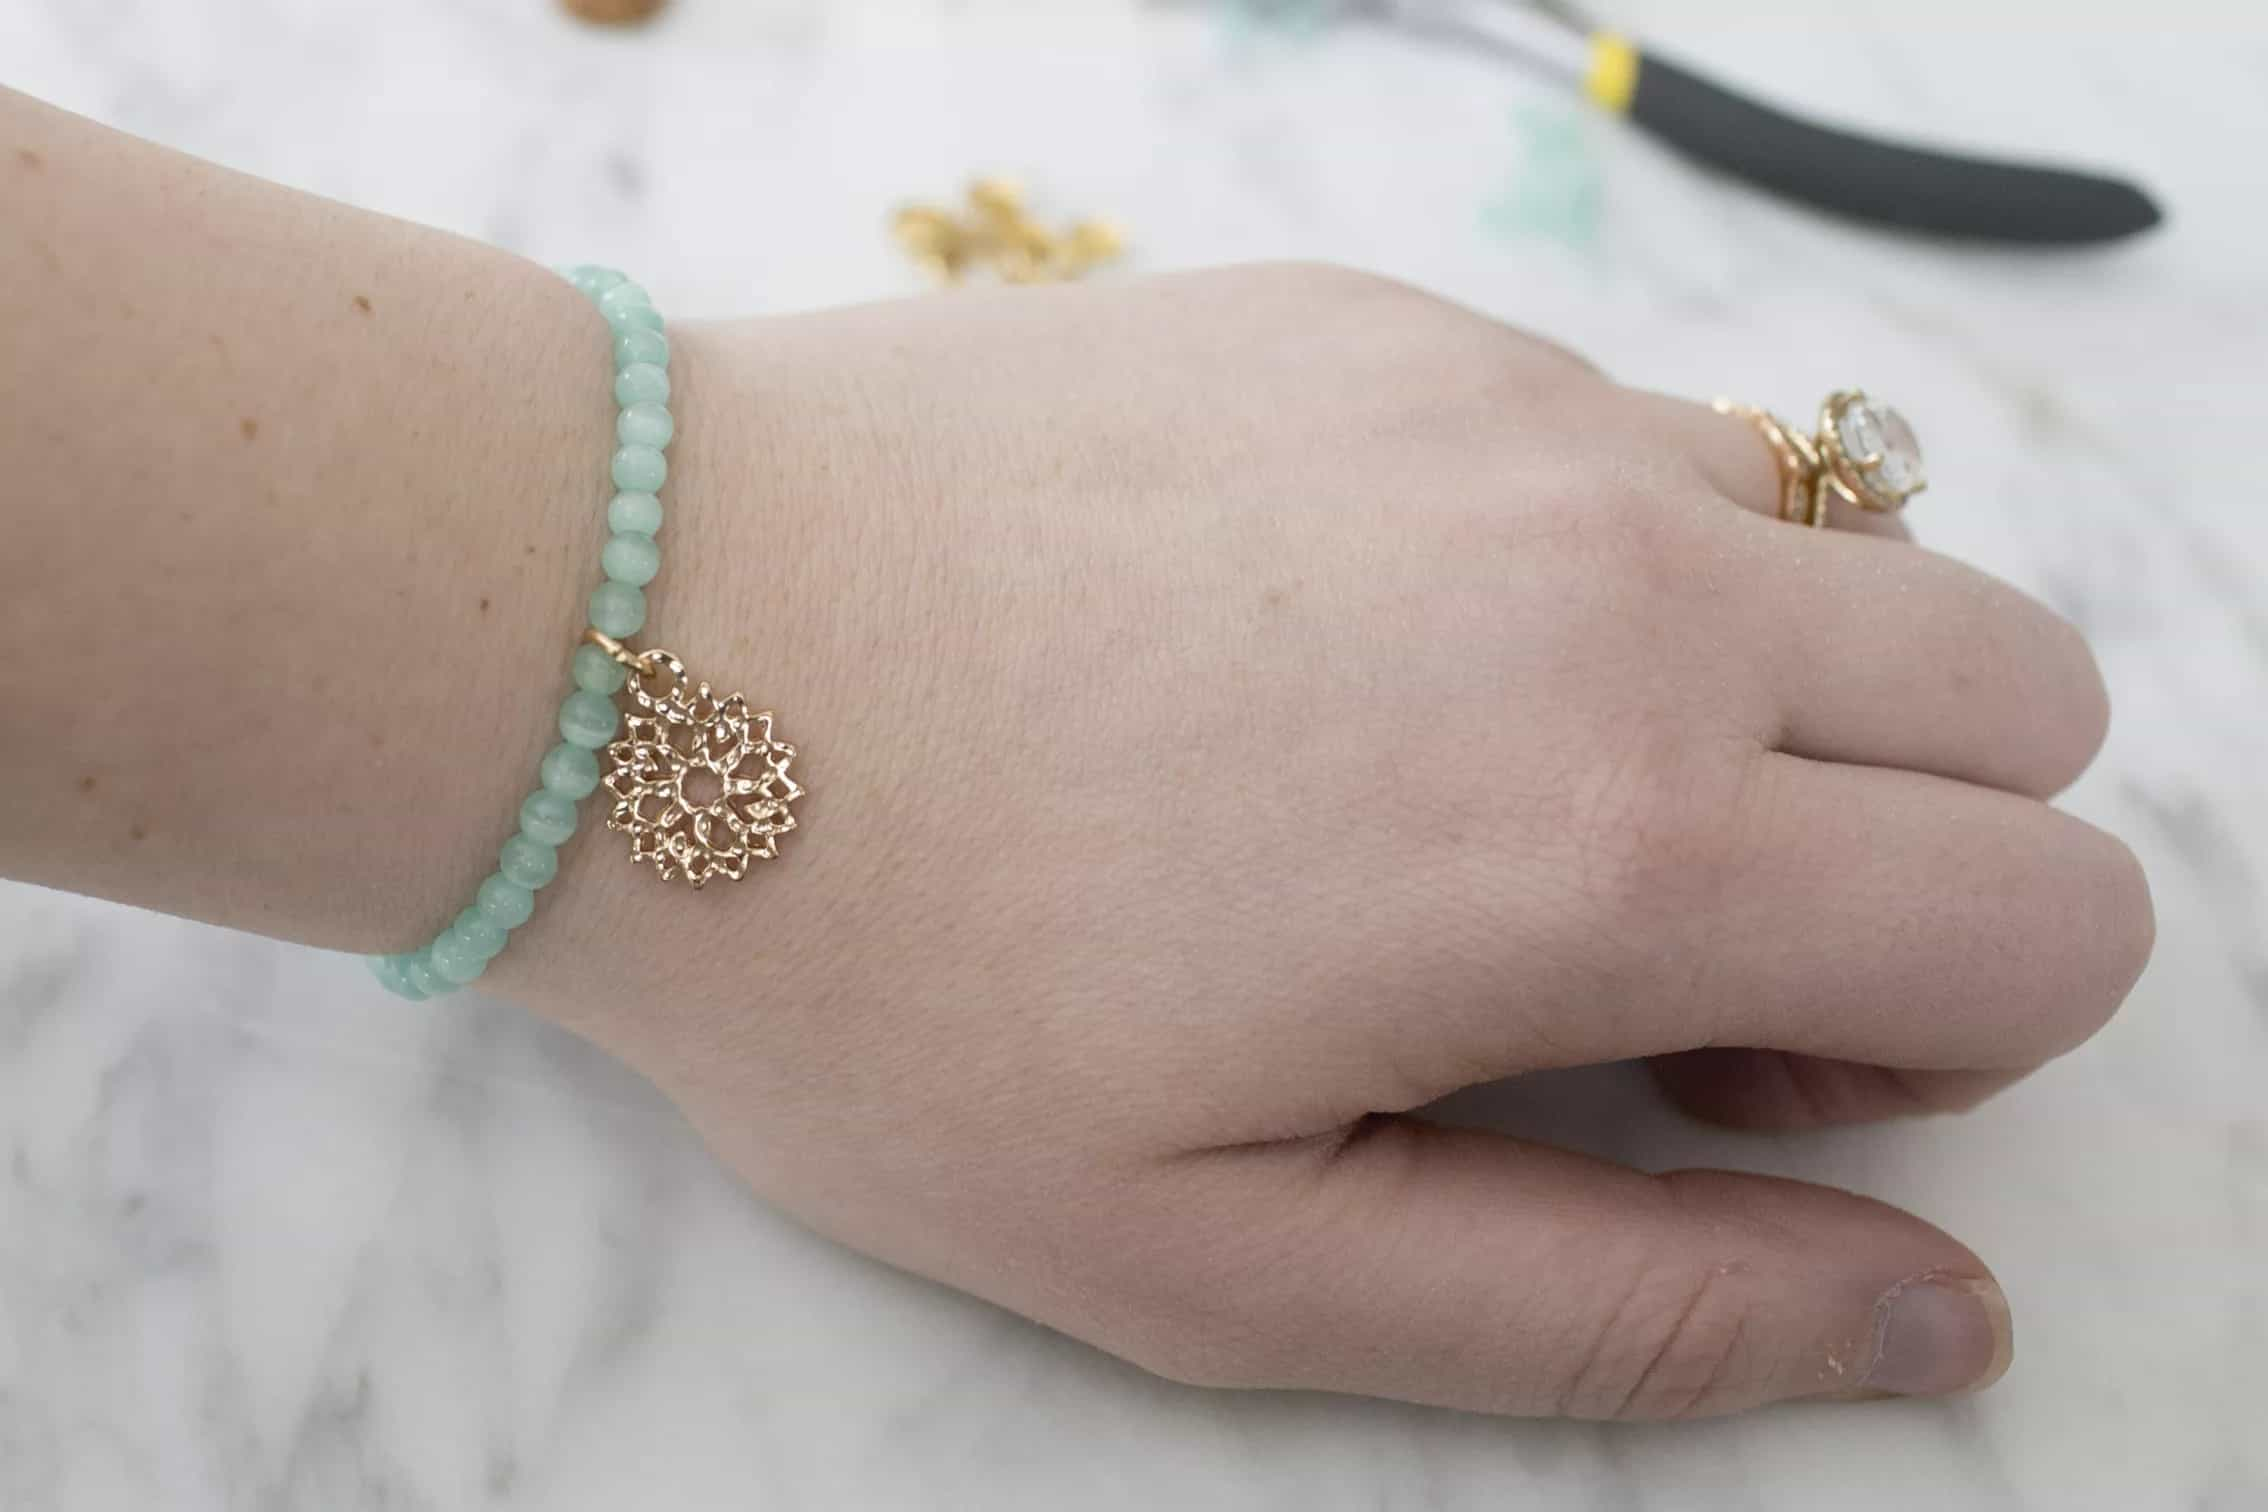 DIY Beaded Bracelet Tutorial – Thesprucecrafts.com